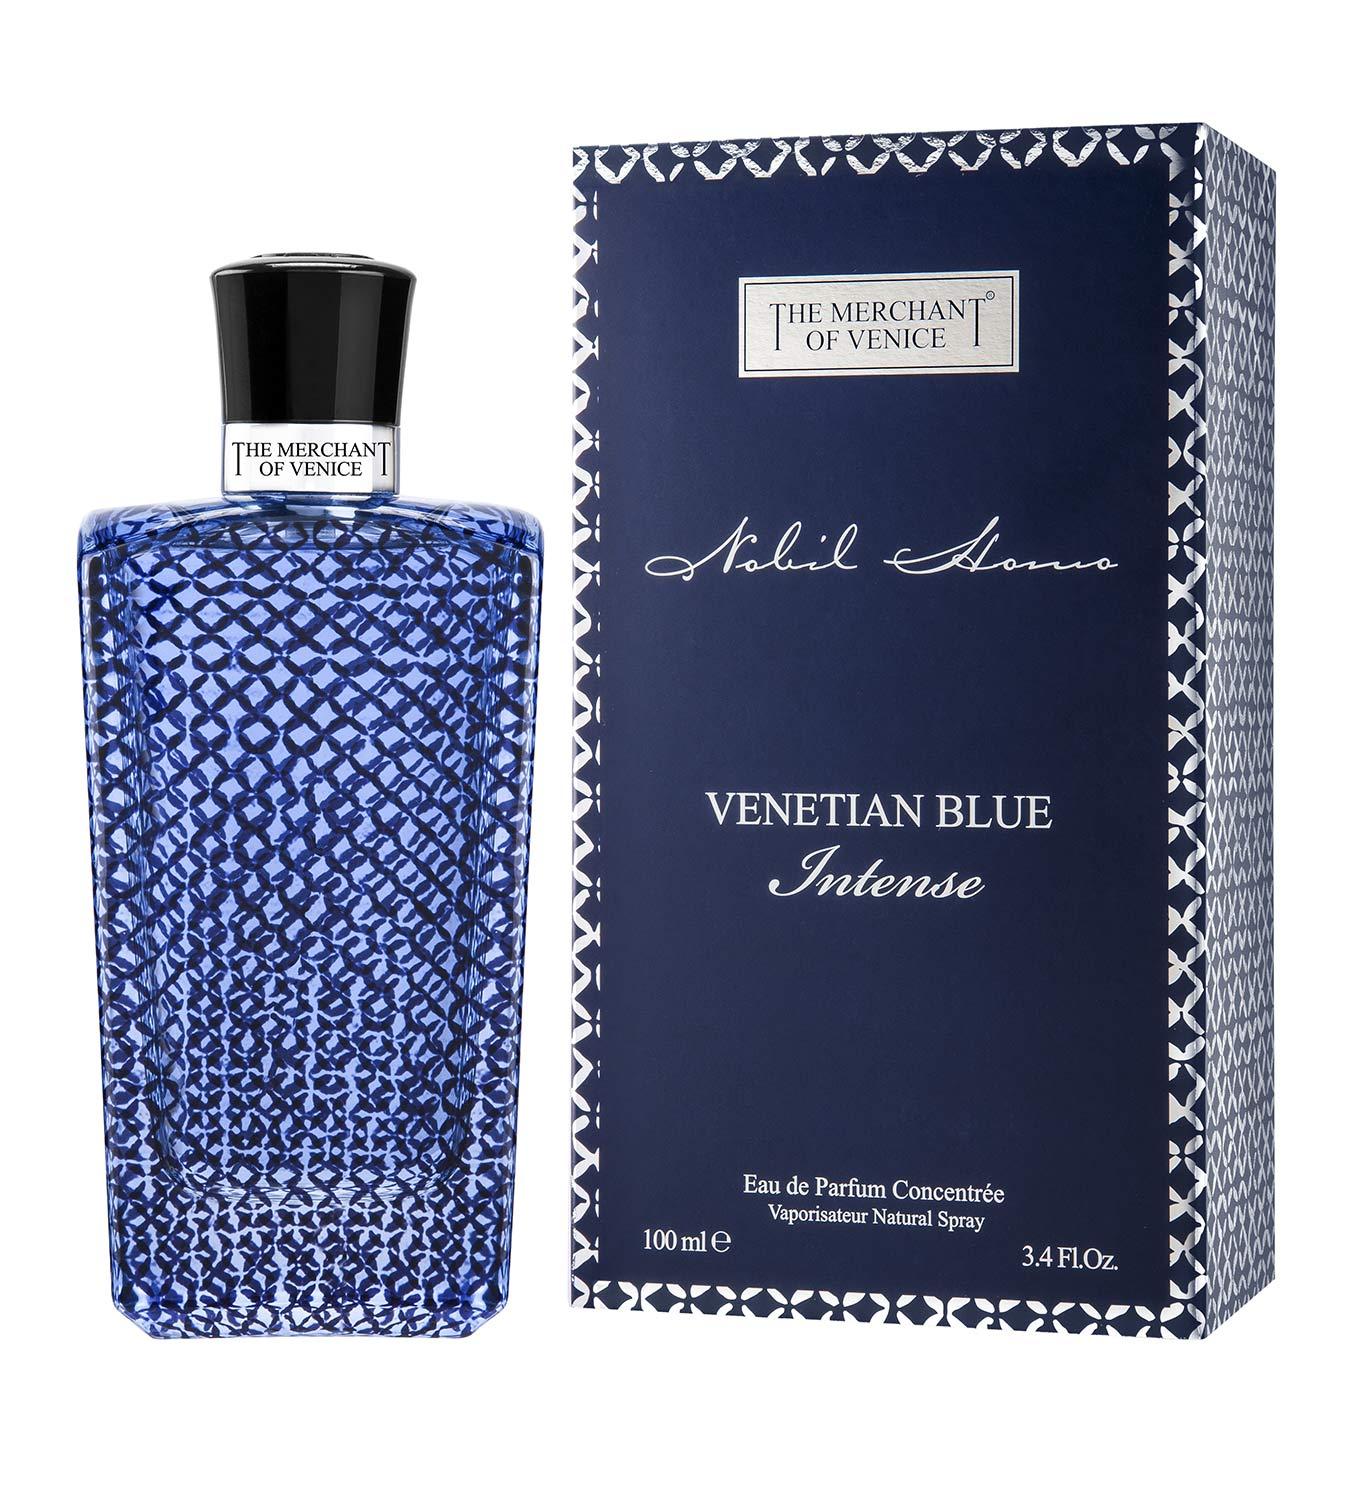 The Merchant Of Venice V Blue Intense Eau de Parfum Masculino